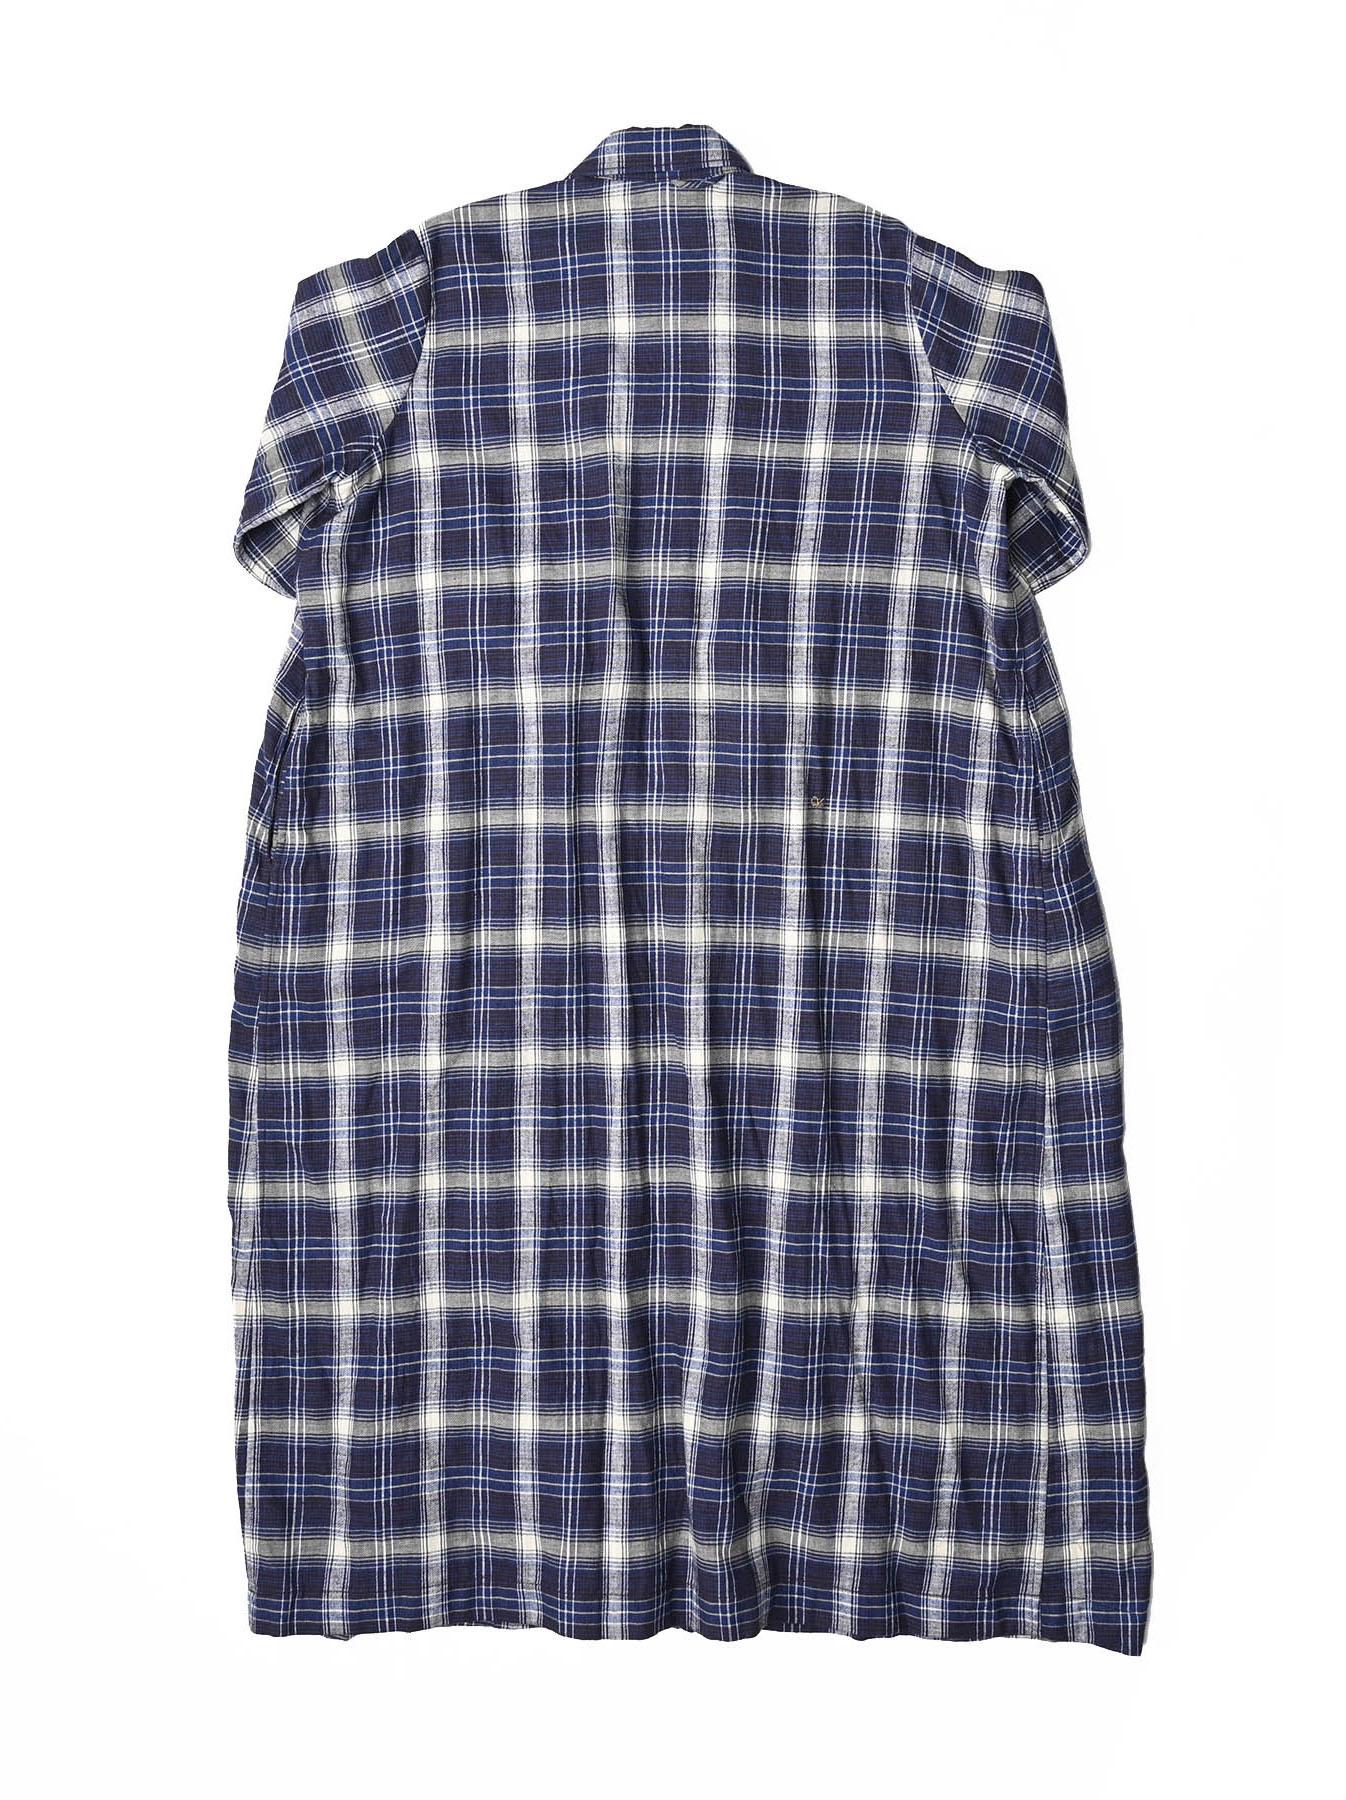 Indigo Twill Double Cloth Shirt Dress-5